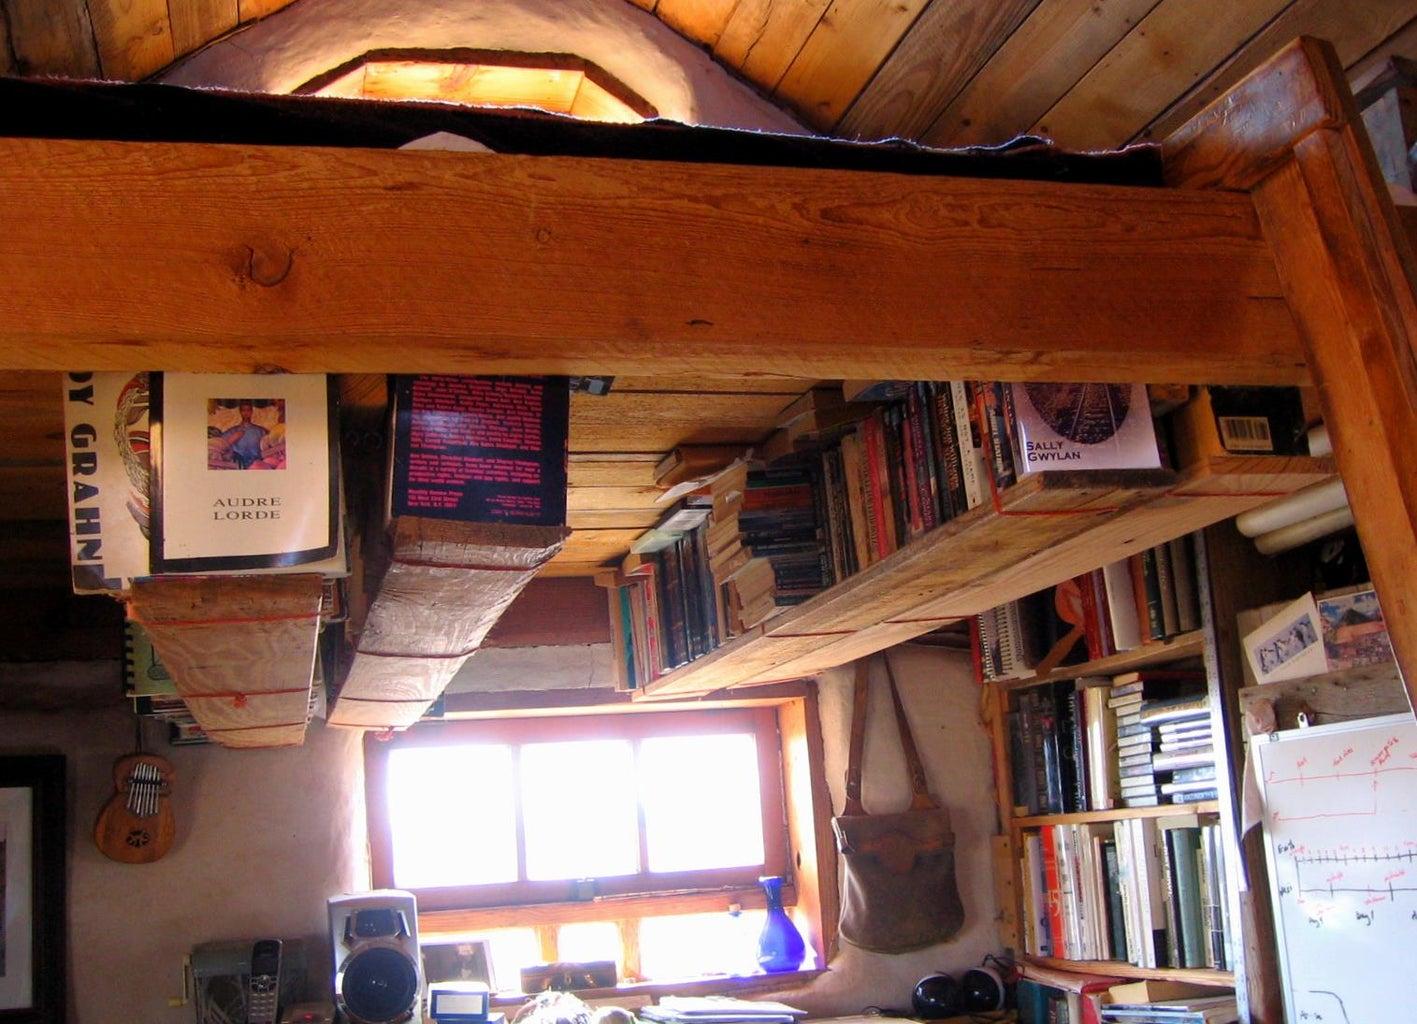 Boards & Baling Twine: a Rafter Bookshelf